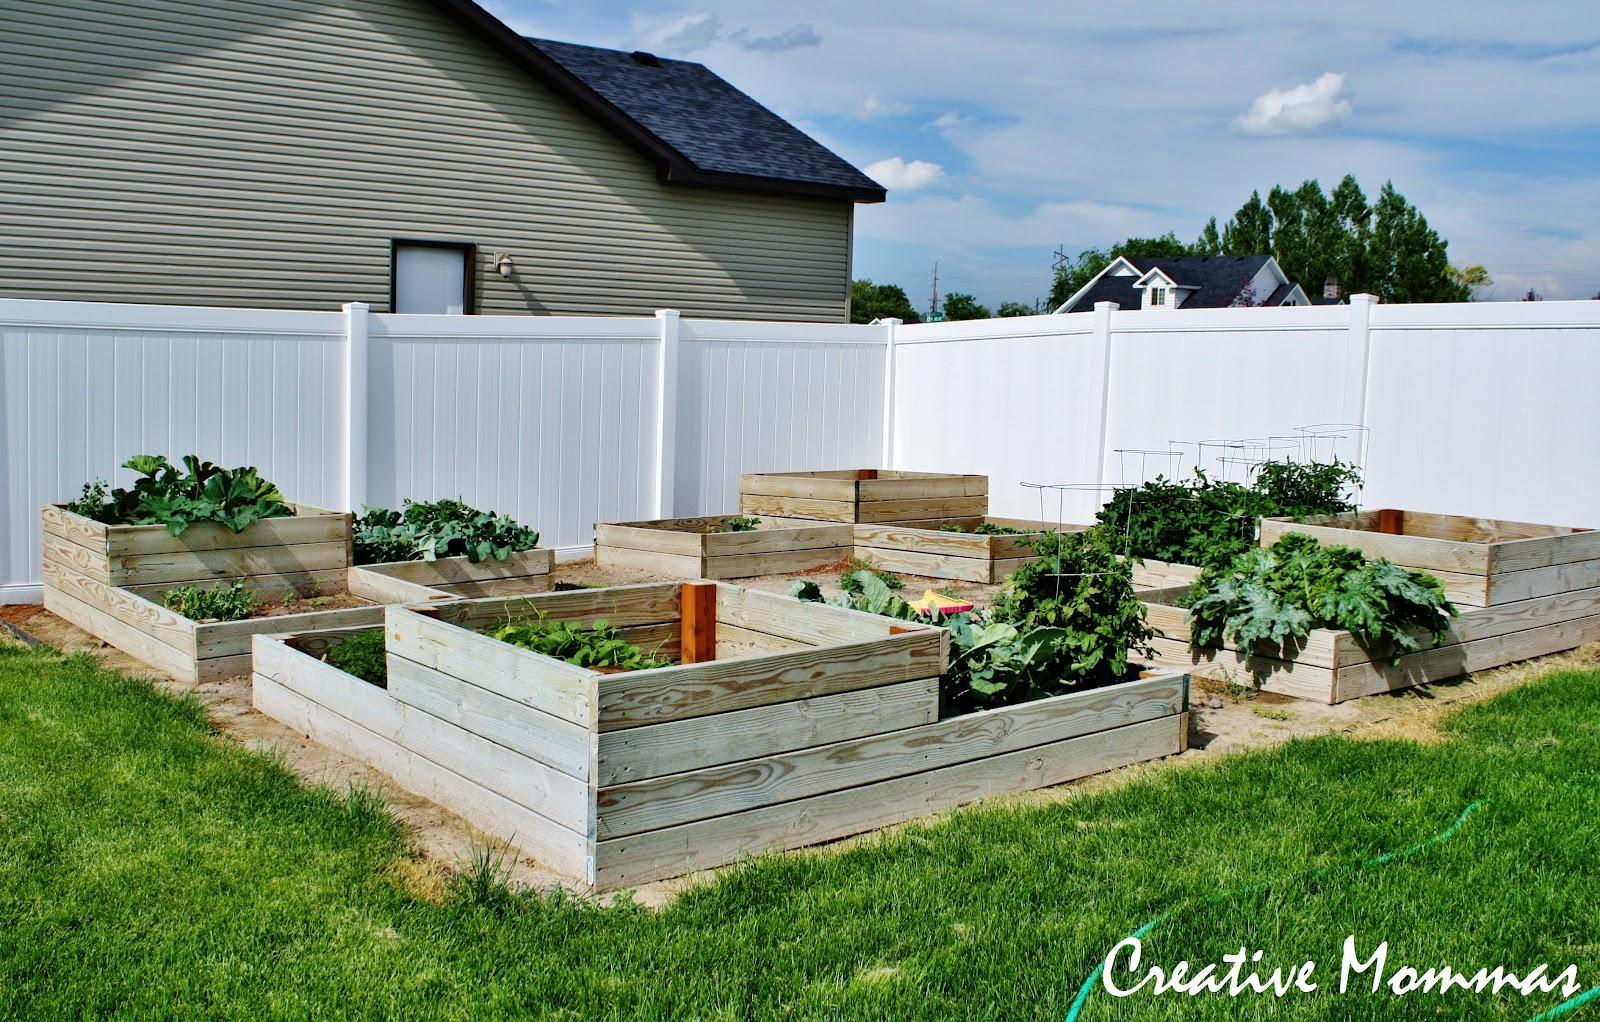 Garden Design For Raised Beds: Creative Mommas: DIY Tiered Raised Garden Beds